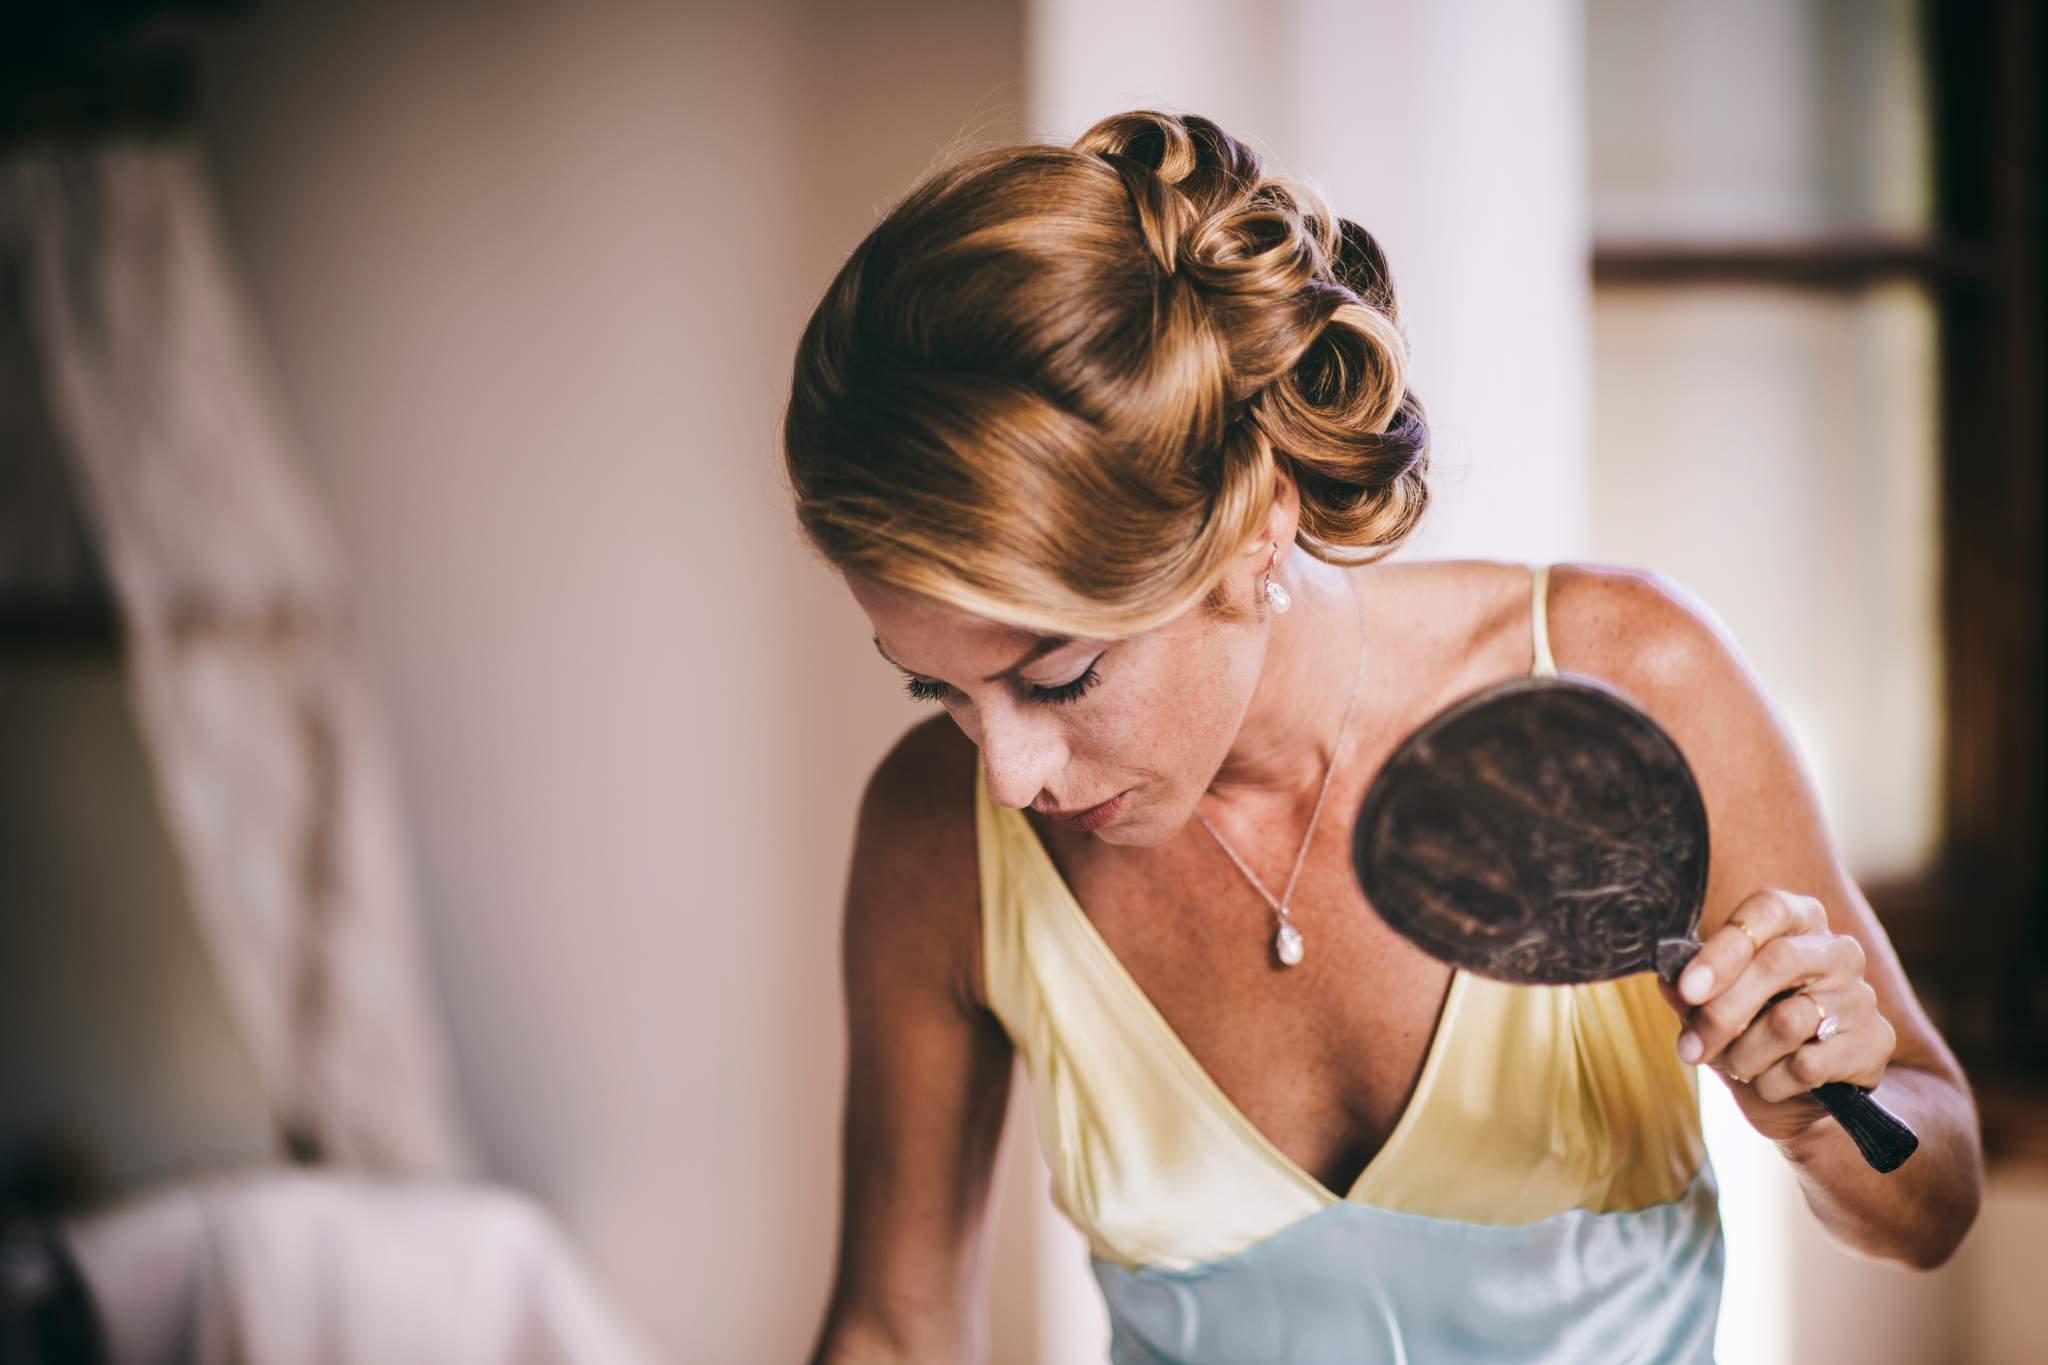 17fotografo-matrimonio-toscana-villa-teresa